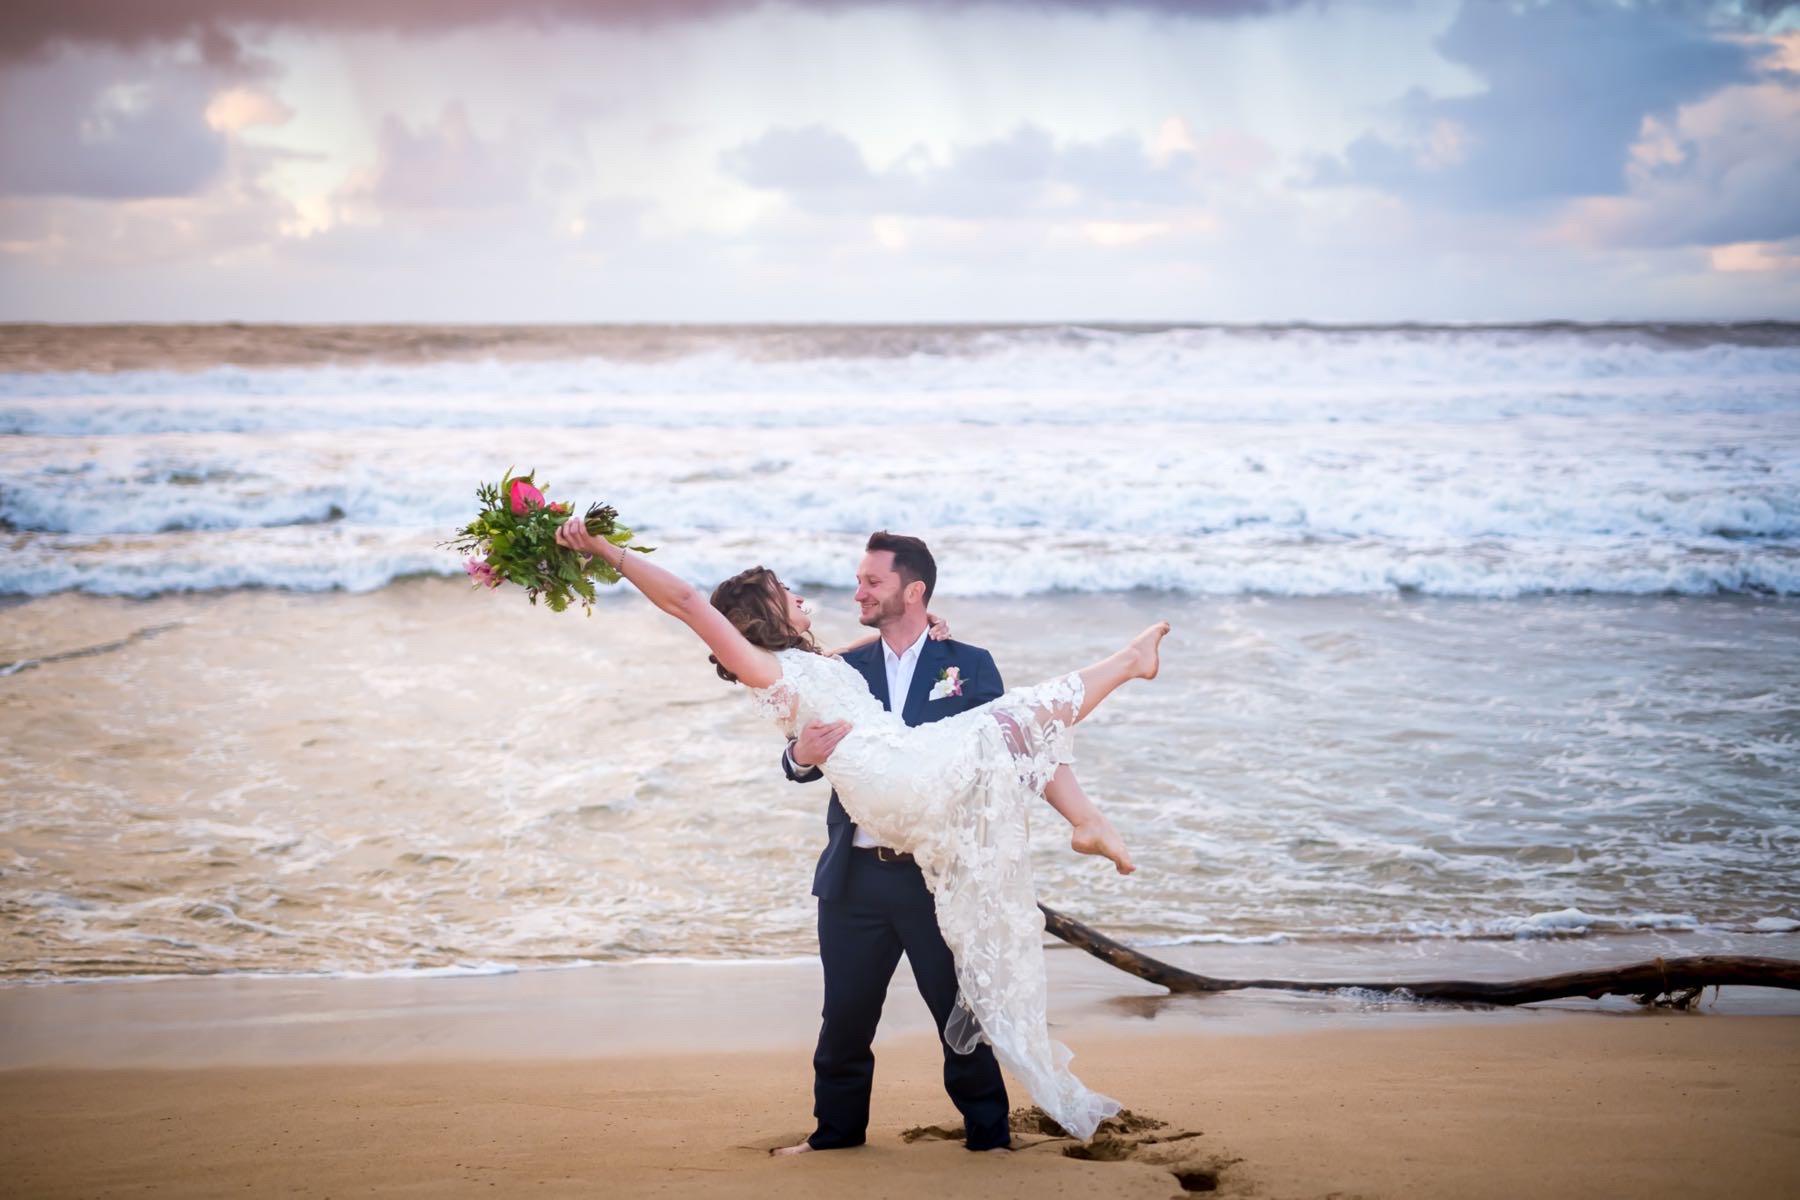 Lori & Joseph eloping in Kauai.